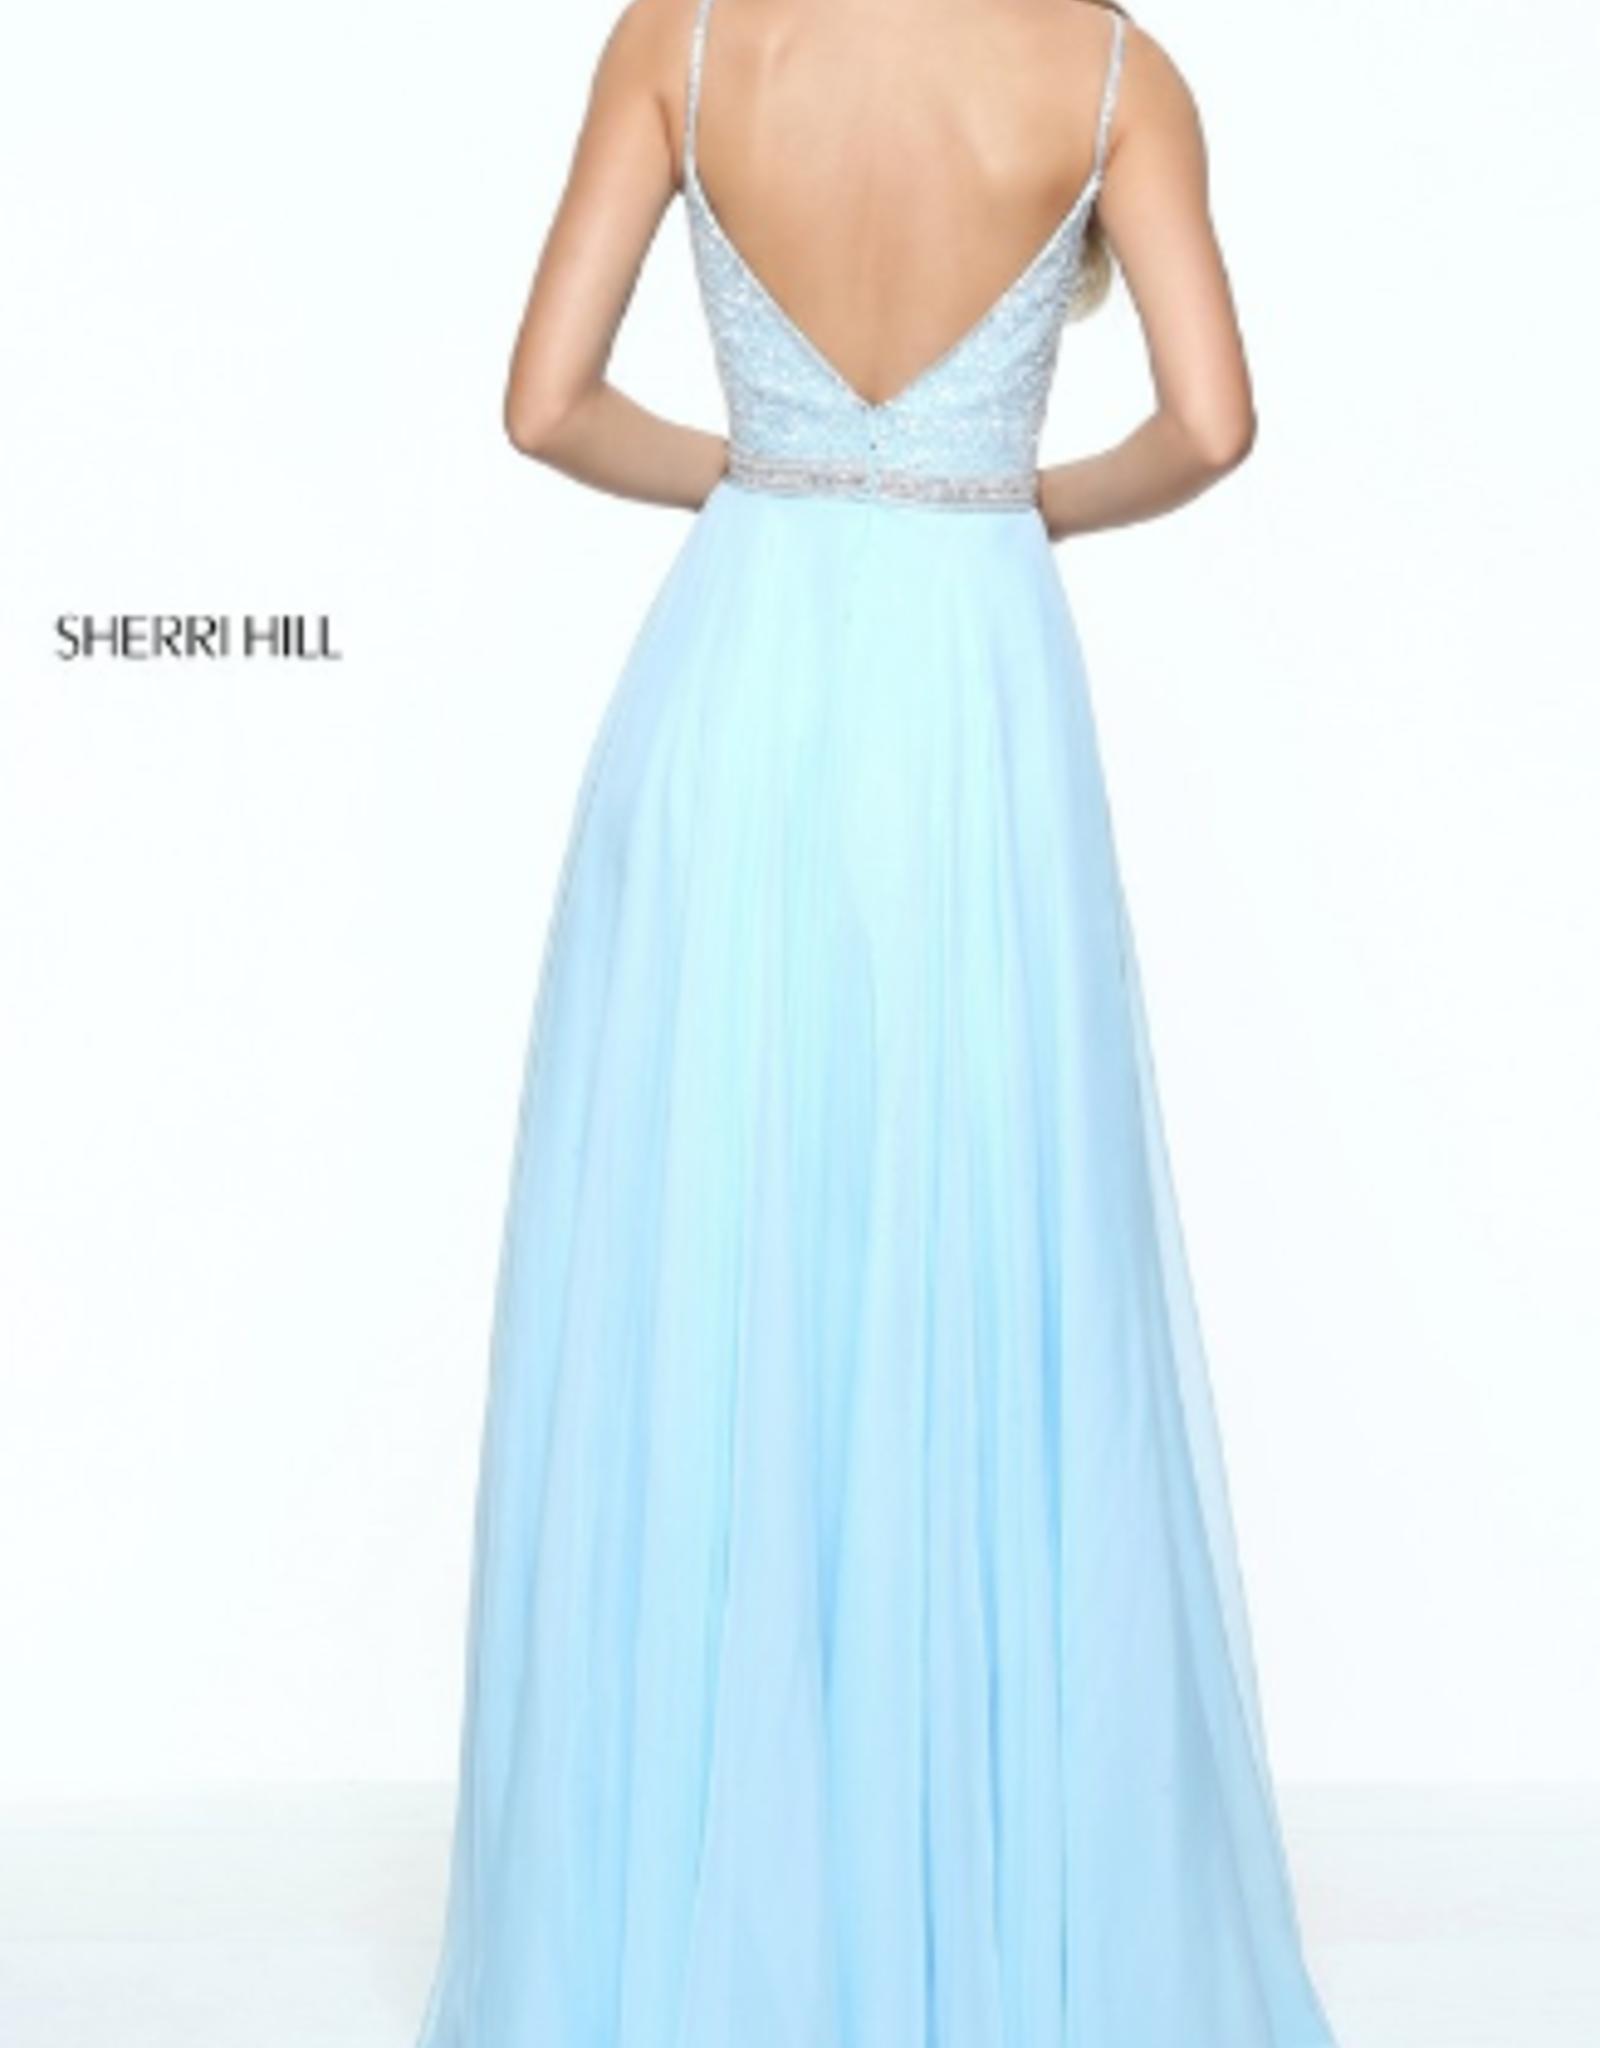 Sherri Hill Sherri Hill Light Blue 12